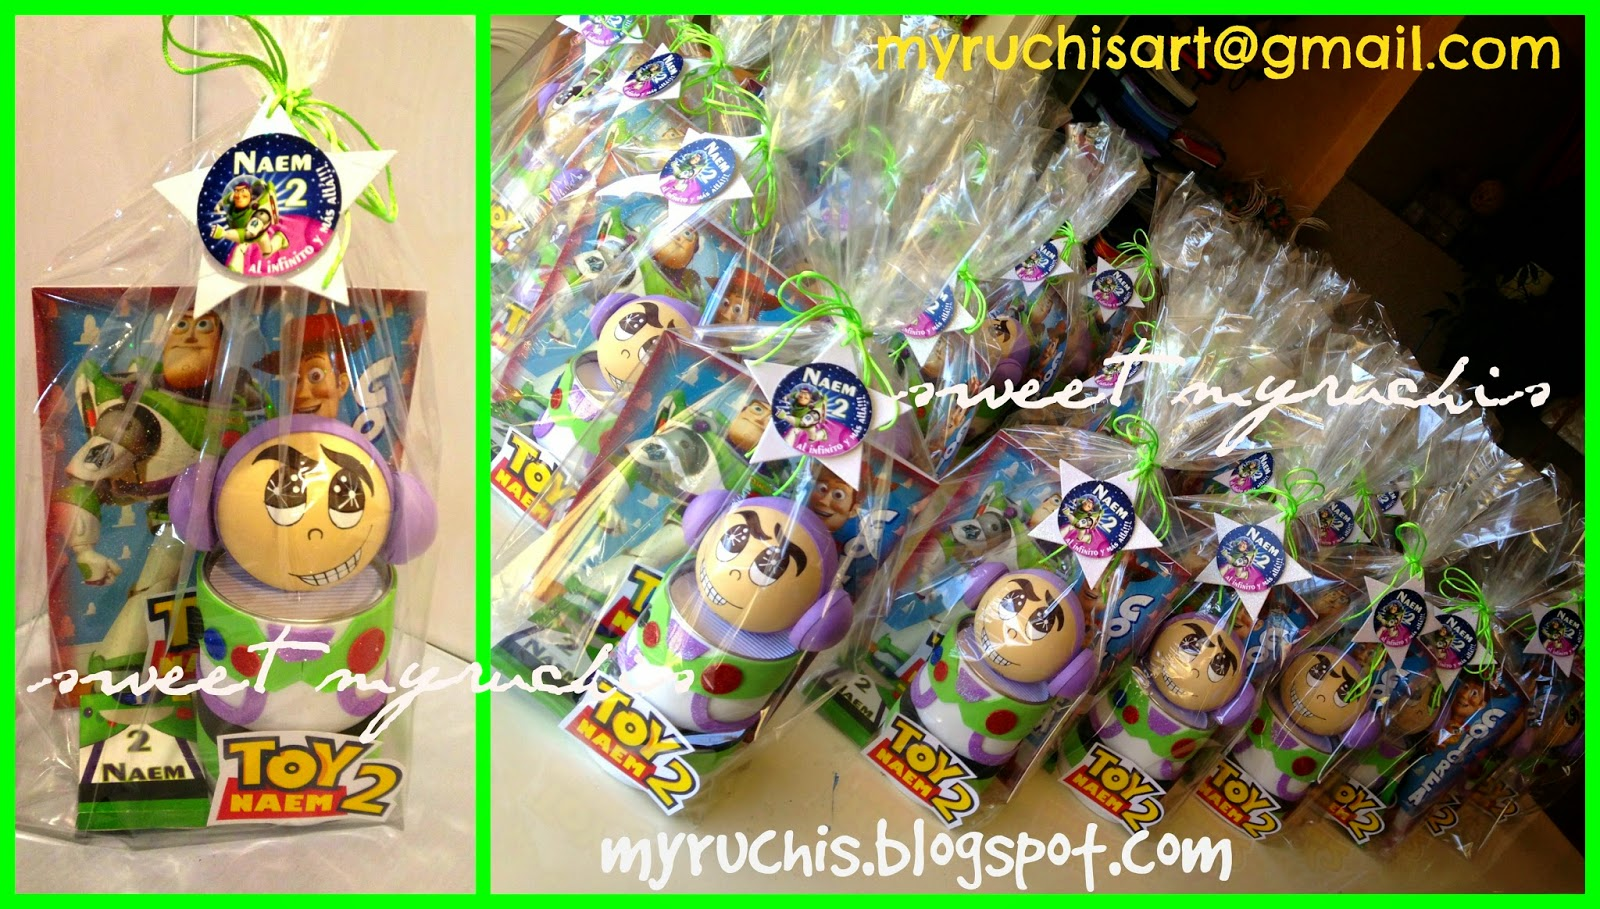 Myruchis: Dulceros Toy Story. Buzz Light Year